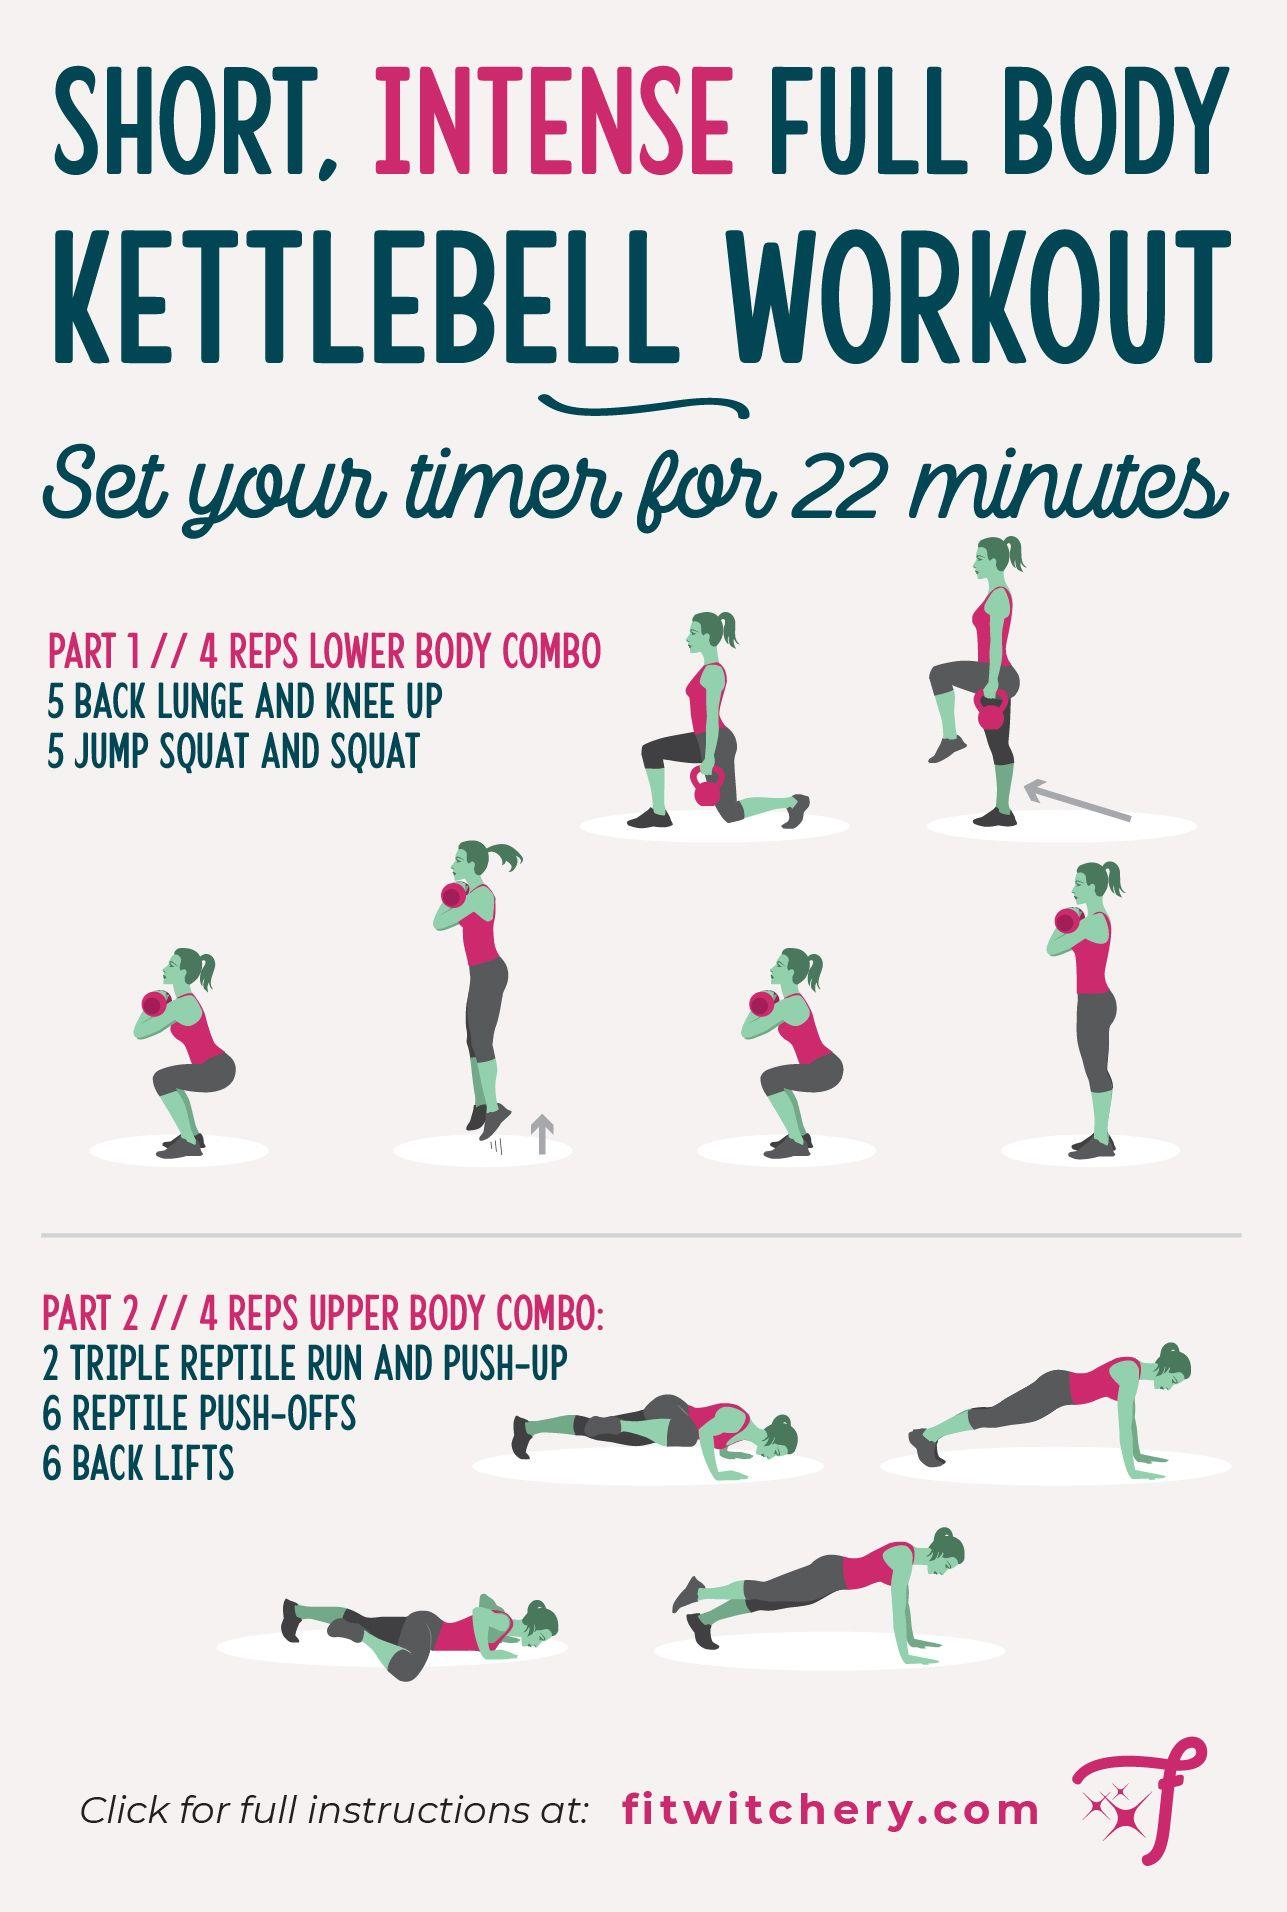 22 Minute Full Body Kettlebell Workout In 2020 Kettlebell Workout Full Body Kettlebell Workout Kettlebell